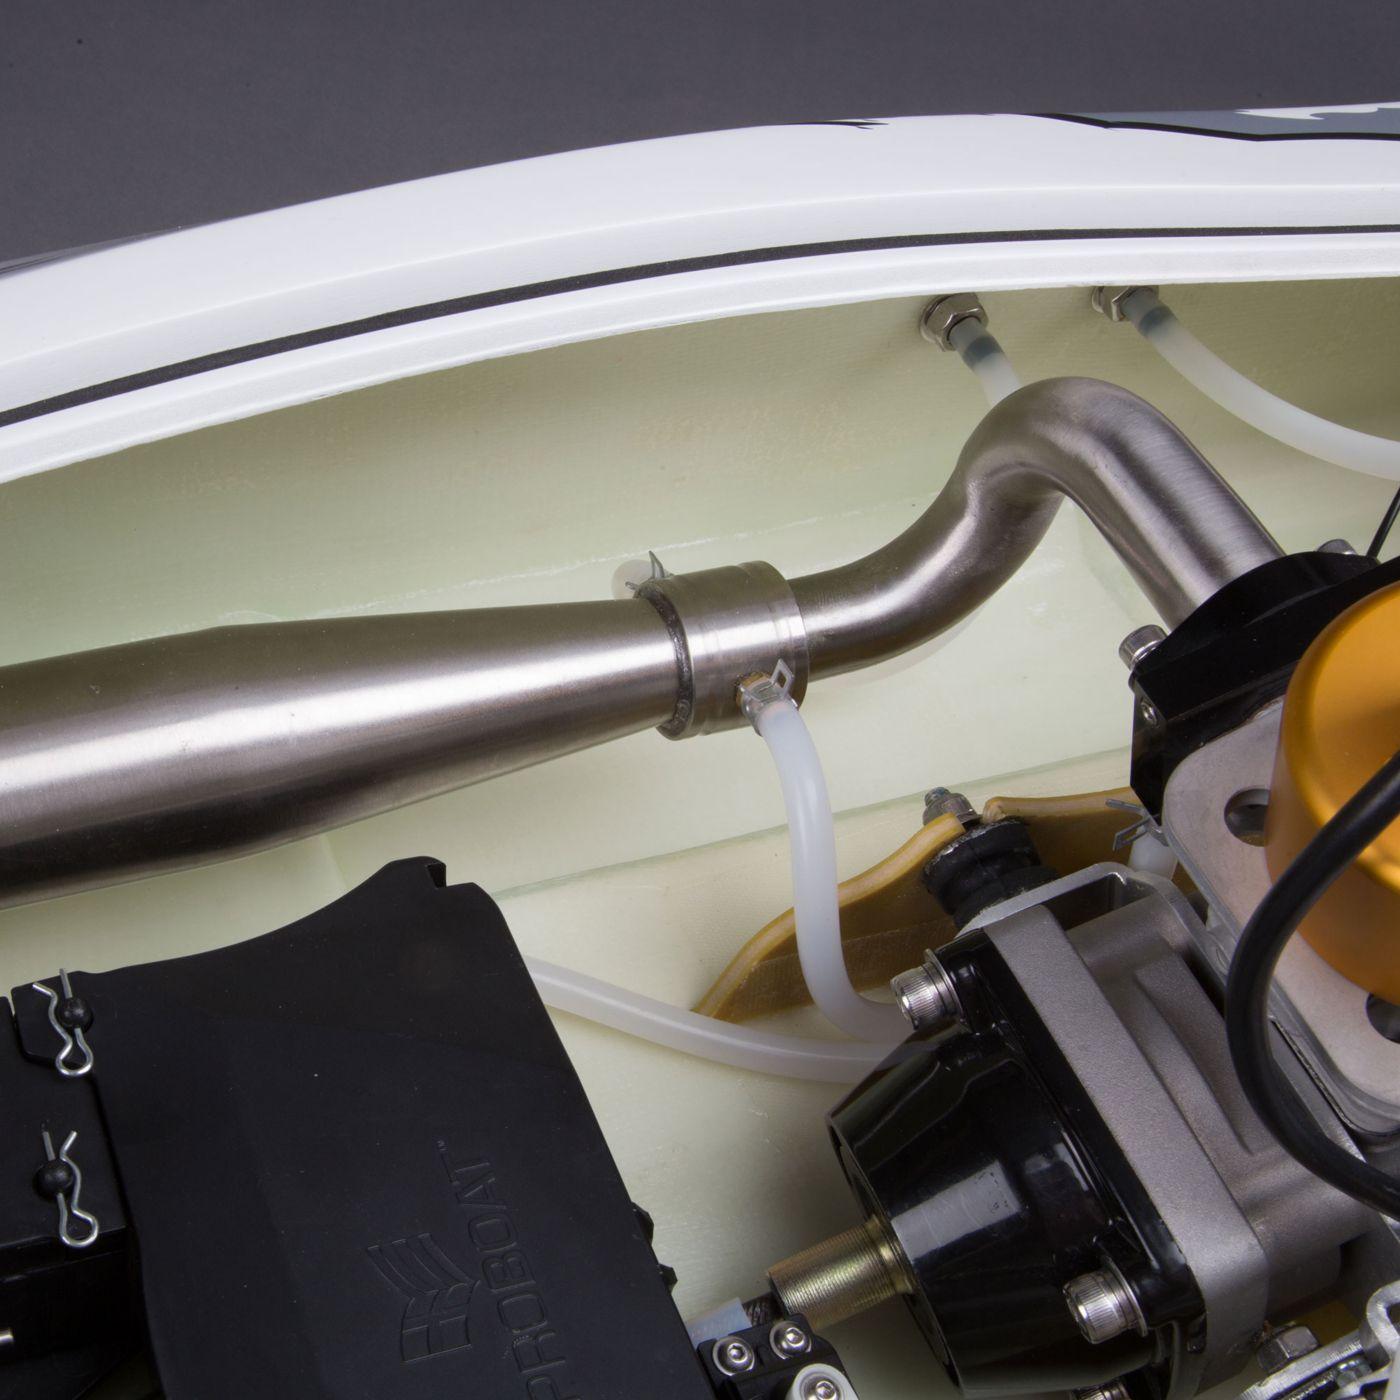 Zelos G 48-inch Catamaran Gas Powered: RTR | Horizon Hobby